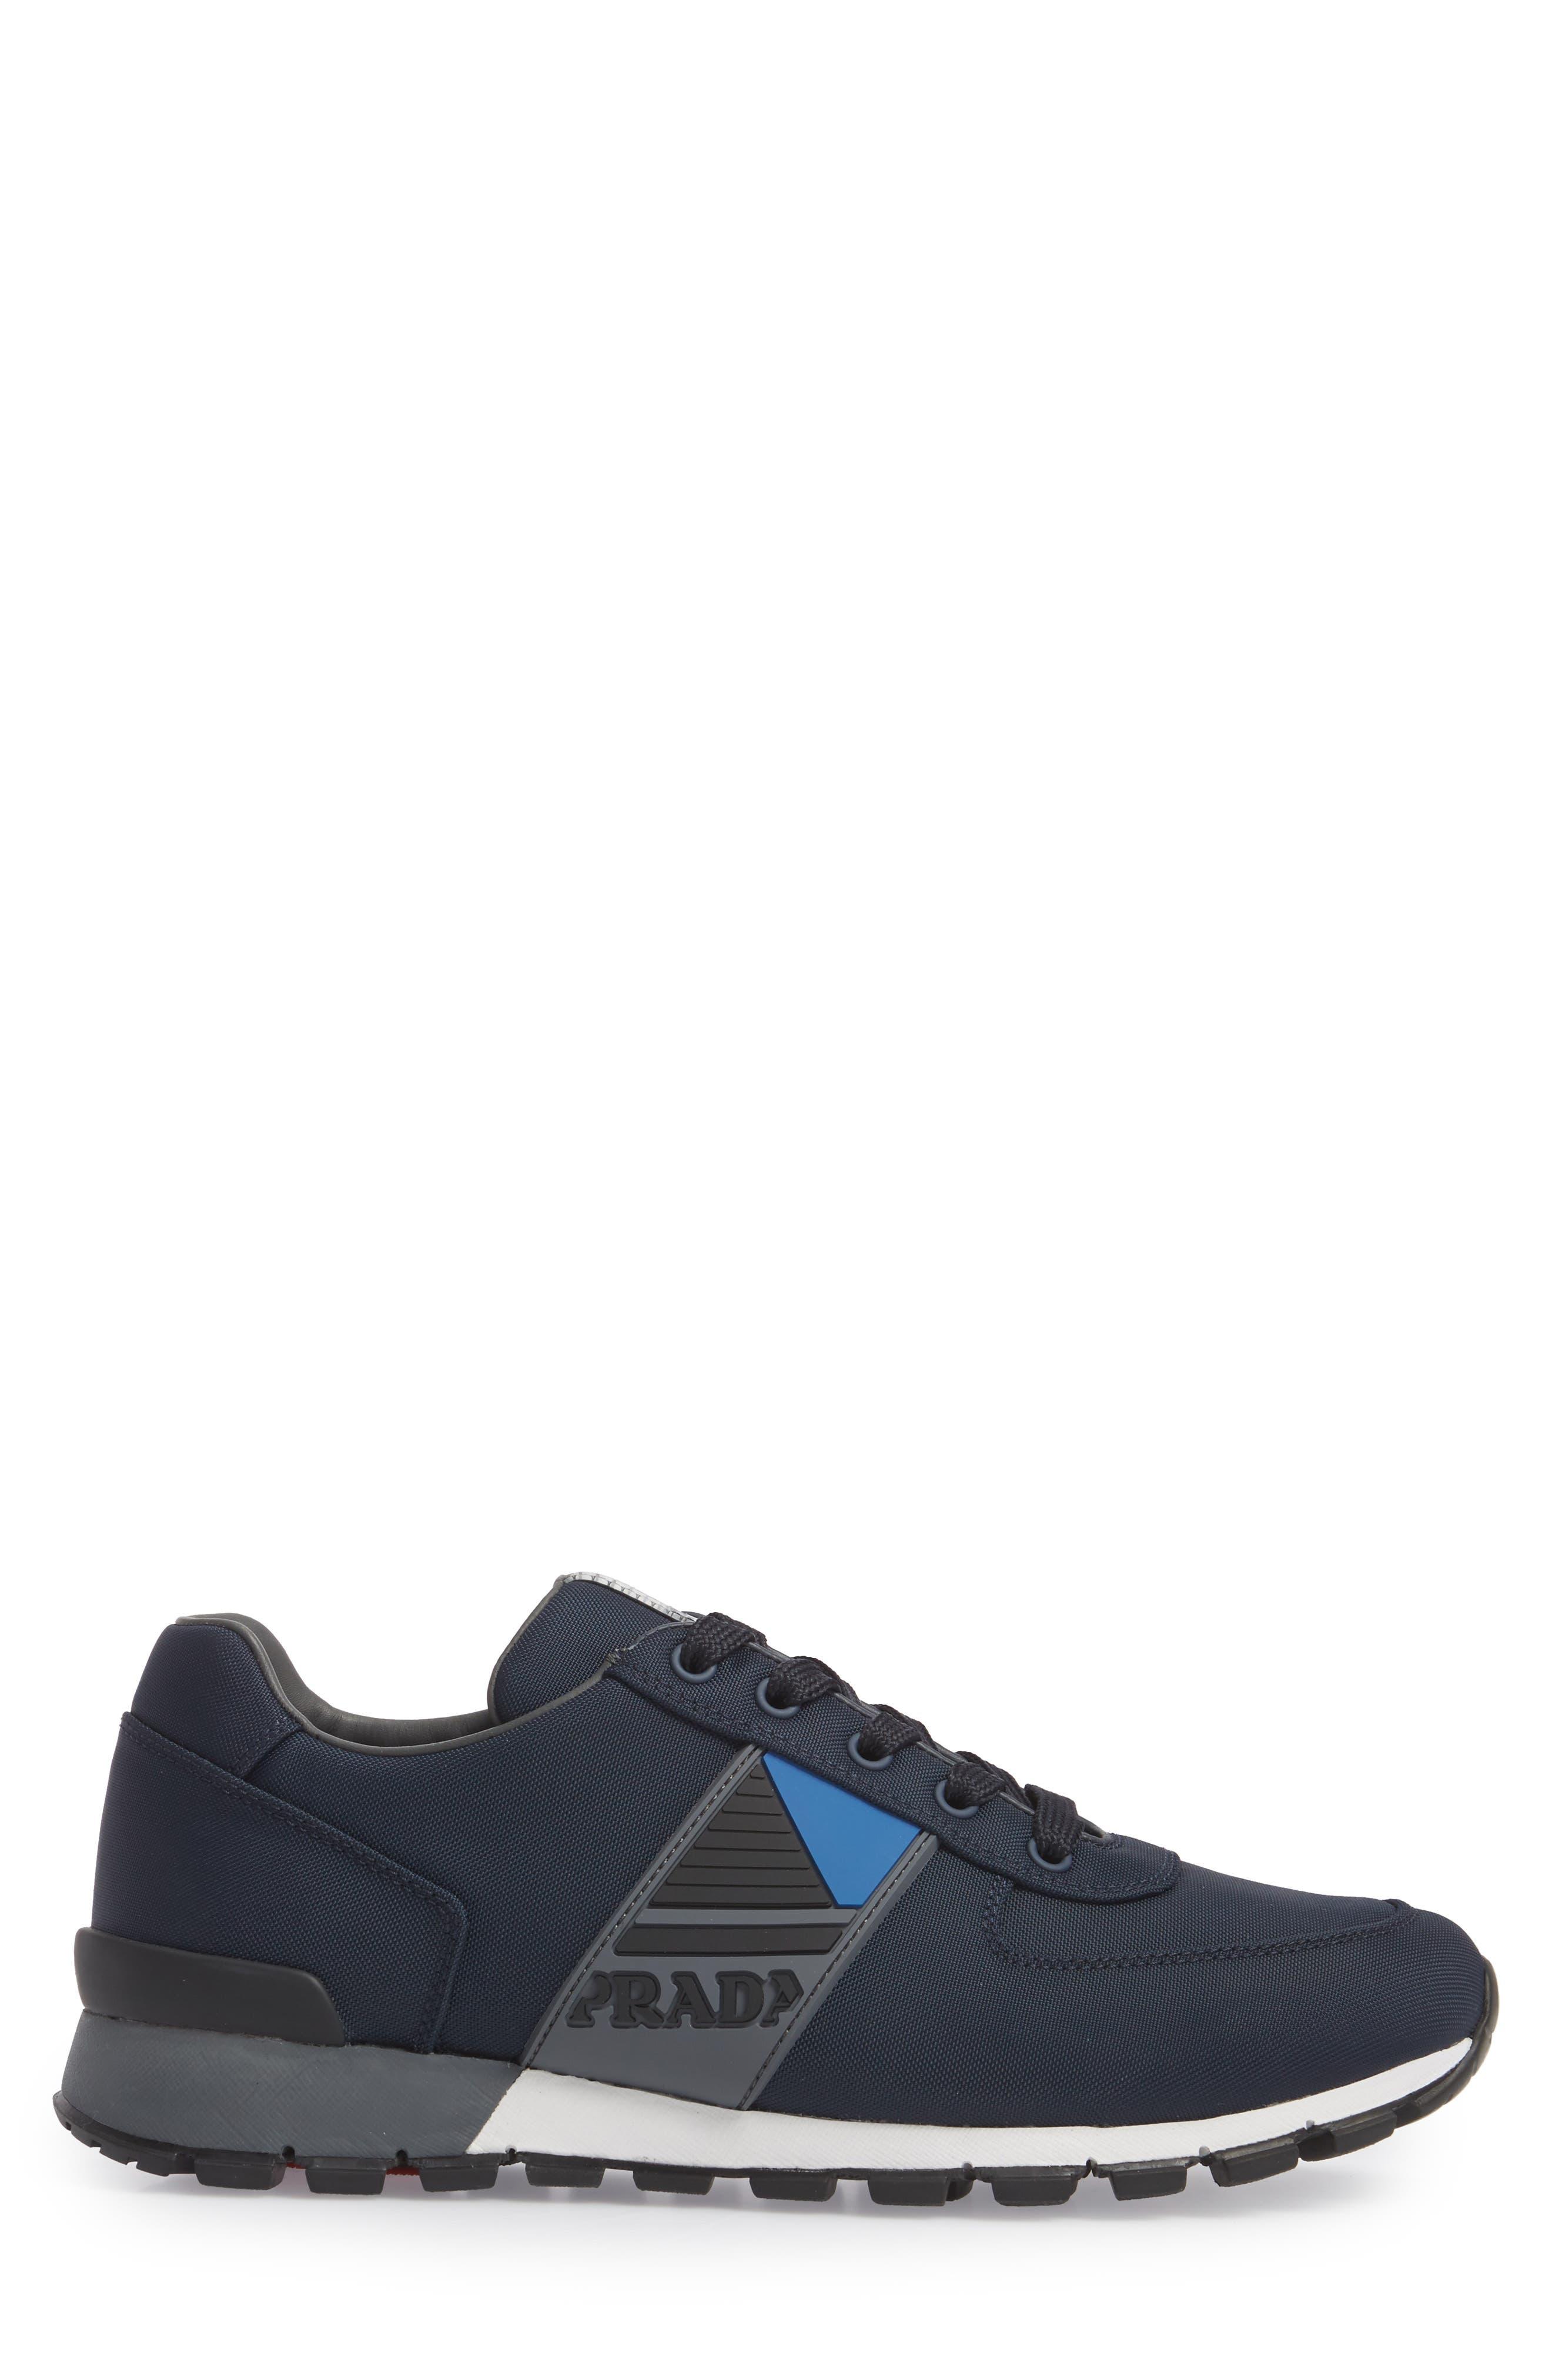 Alternate Image 3  - Prada Linea Rossa Sneaker (Men)